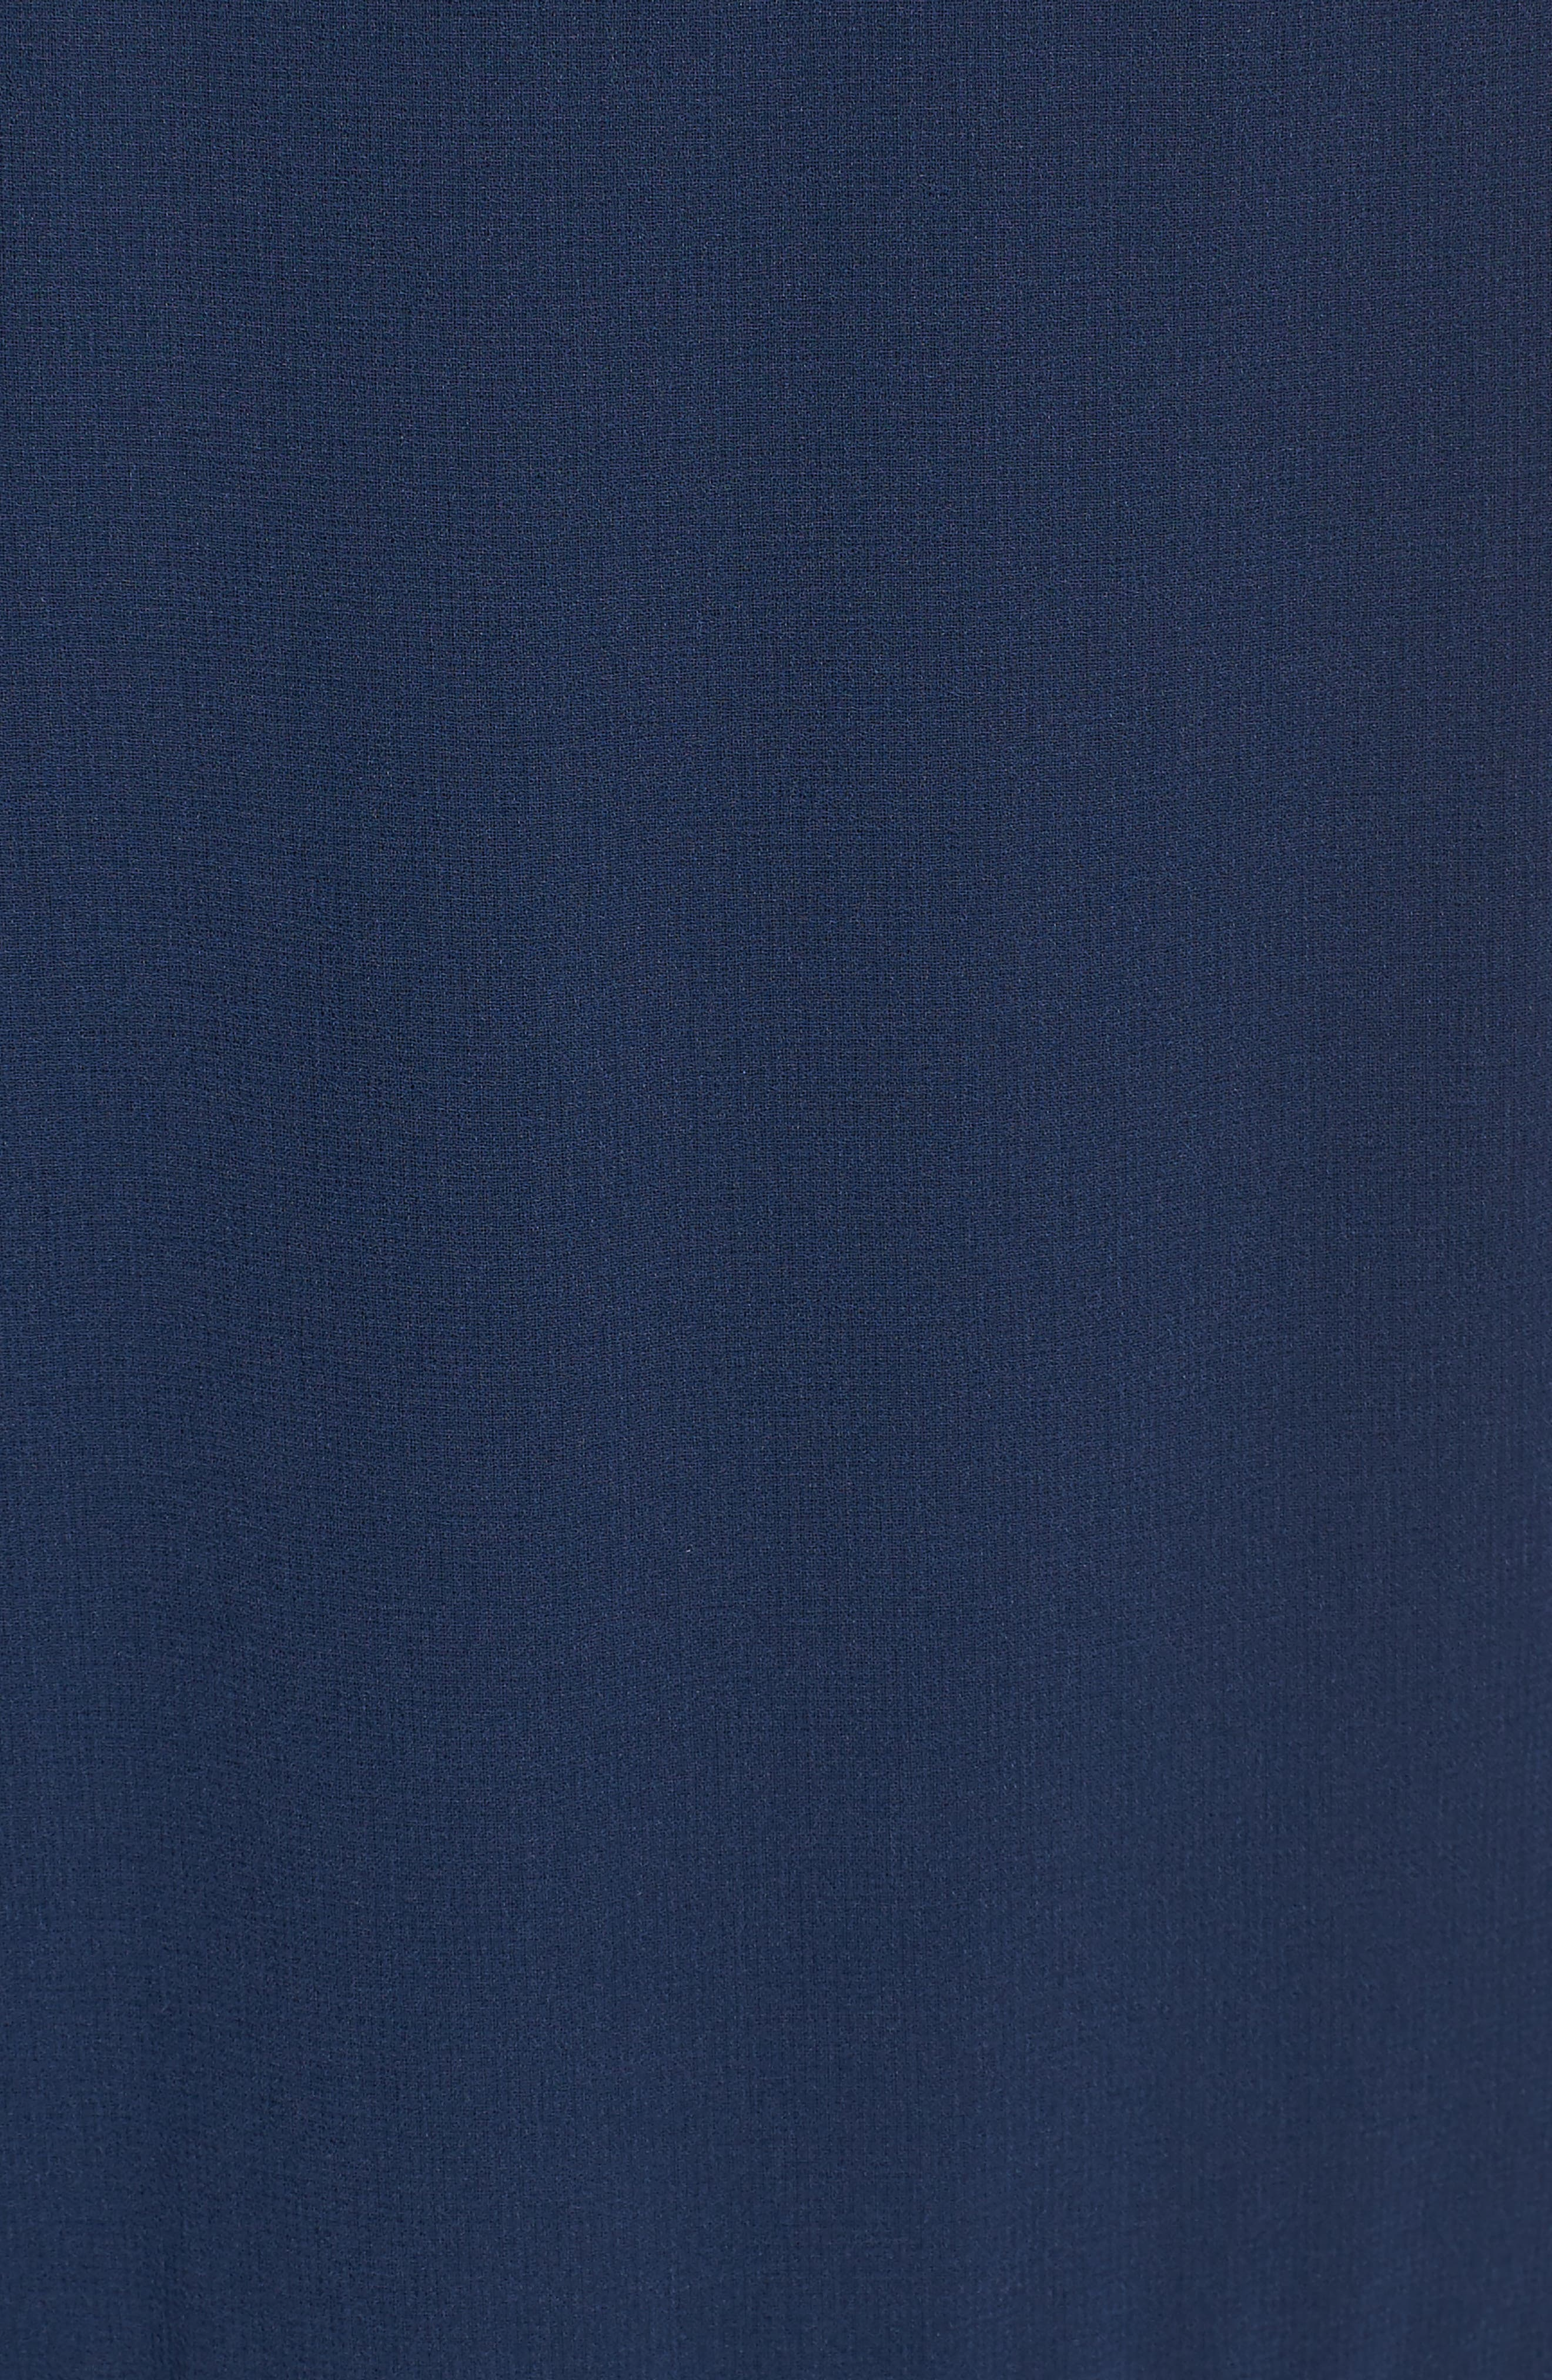 Utopia Cold Shoulder Midi Dress,                             Alternate thumbnail 5, color,                             435